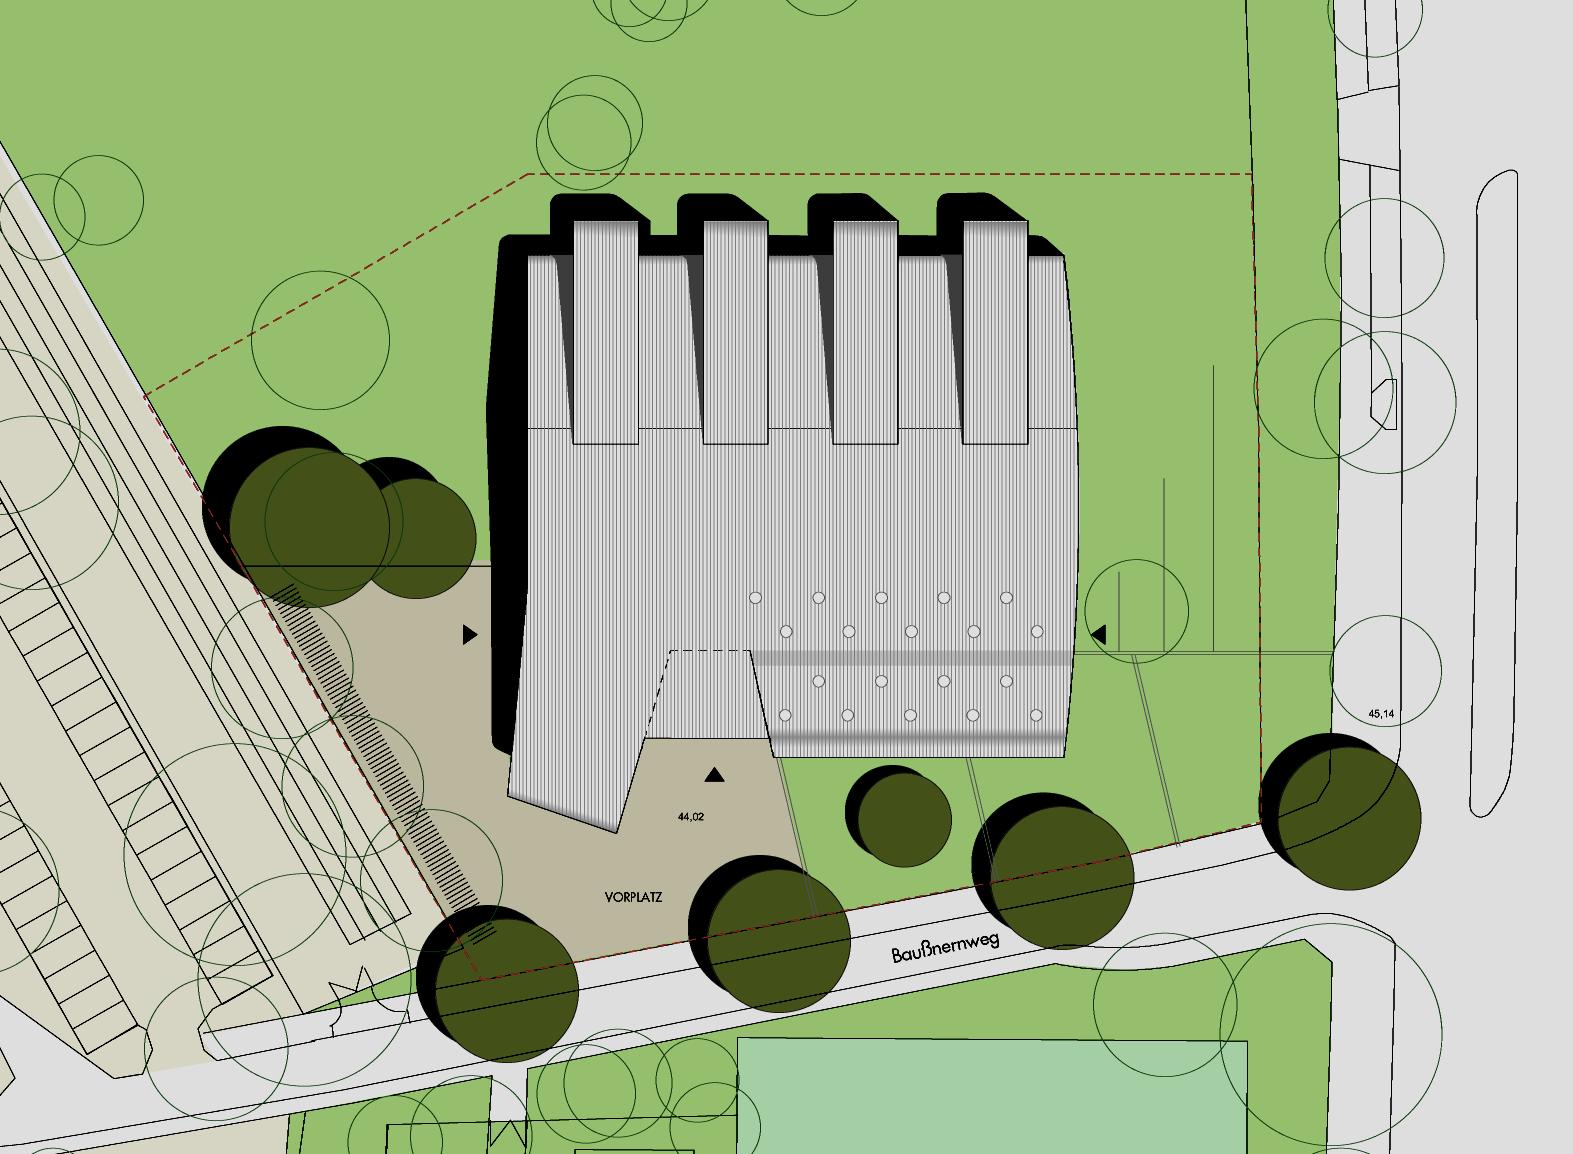 Dreifeld-Sporthalle Baußnernweg, Berlin-Marienfelde: Lageplan